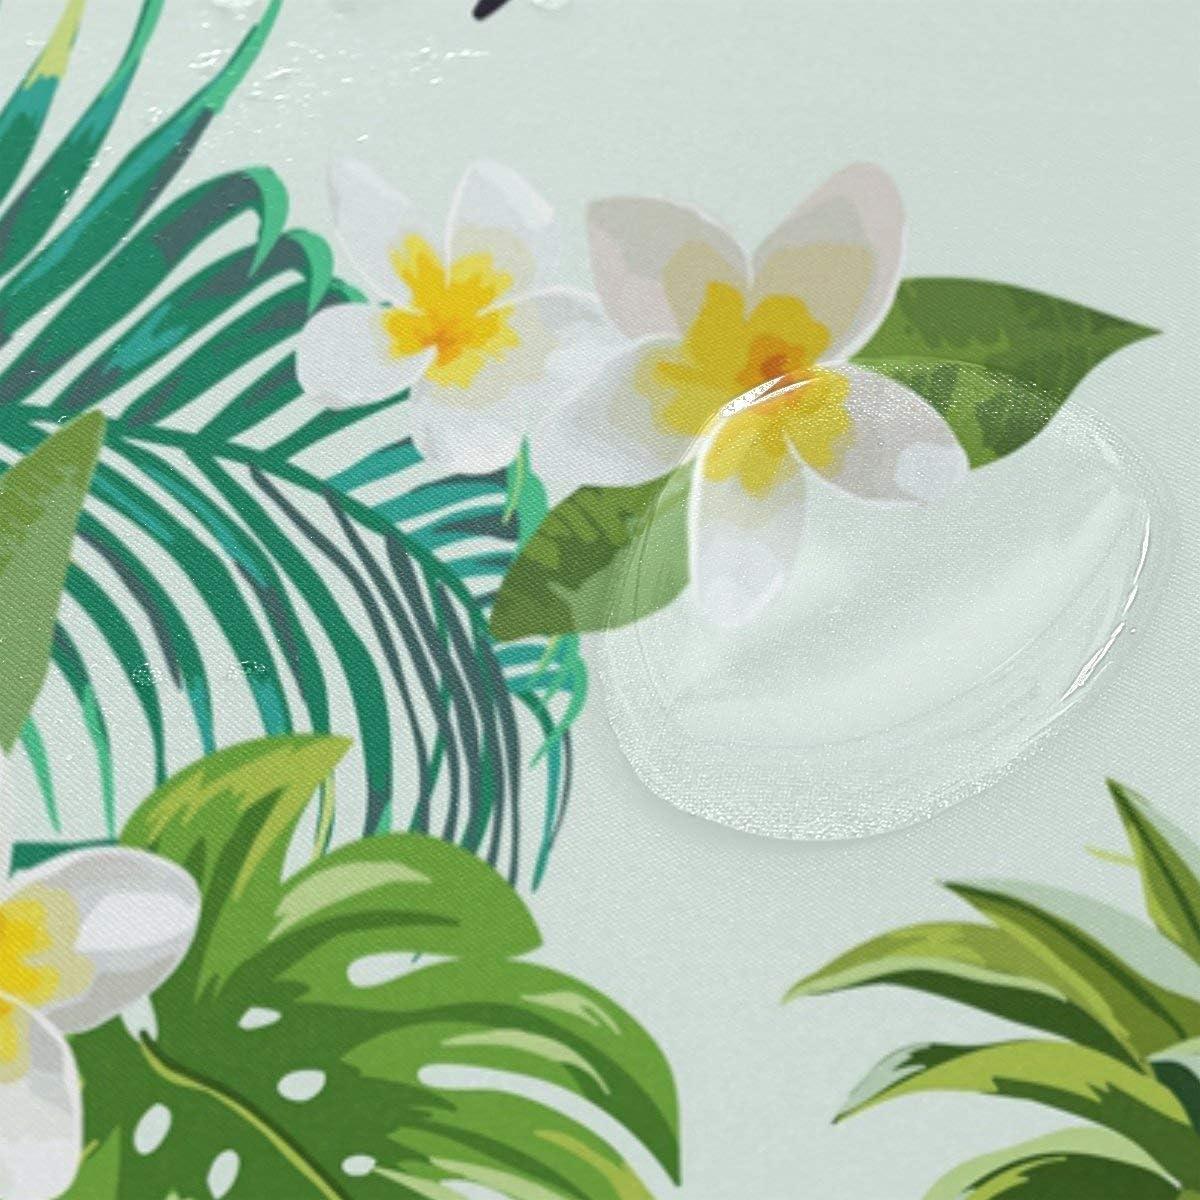 72 x 72 inch Dodou Shower Curtain Flamingos Tropical Plant Pattern Garden Theme Digital Printing Waterproof Polyester Shower Curtain